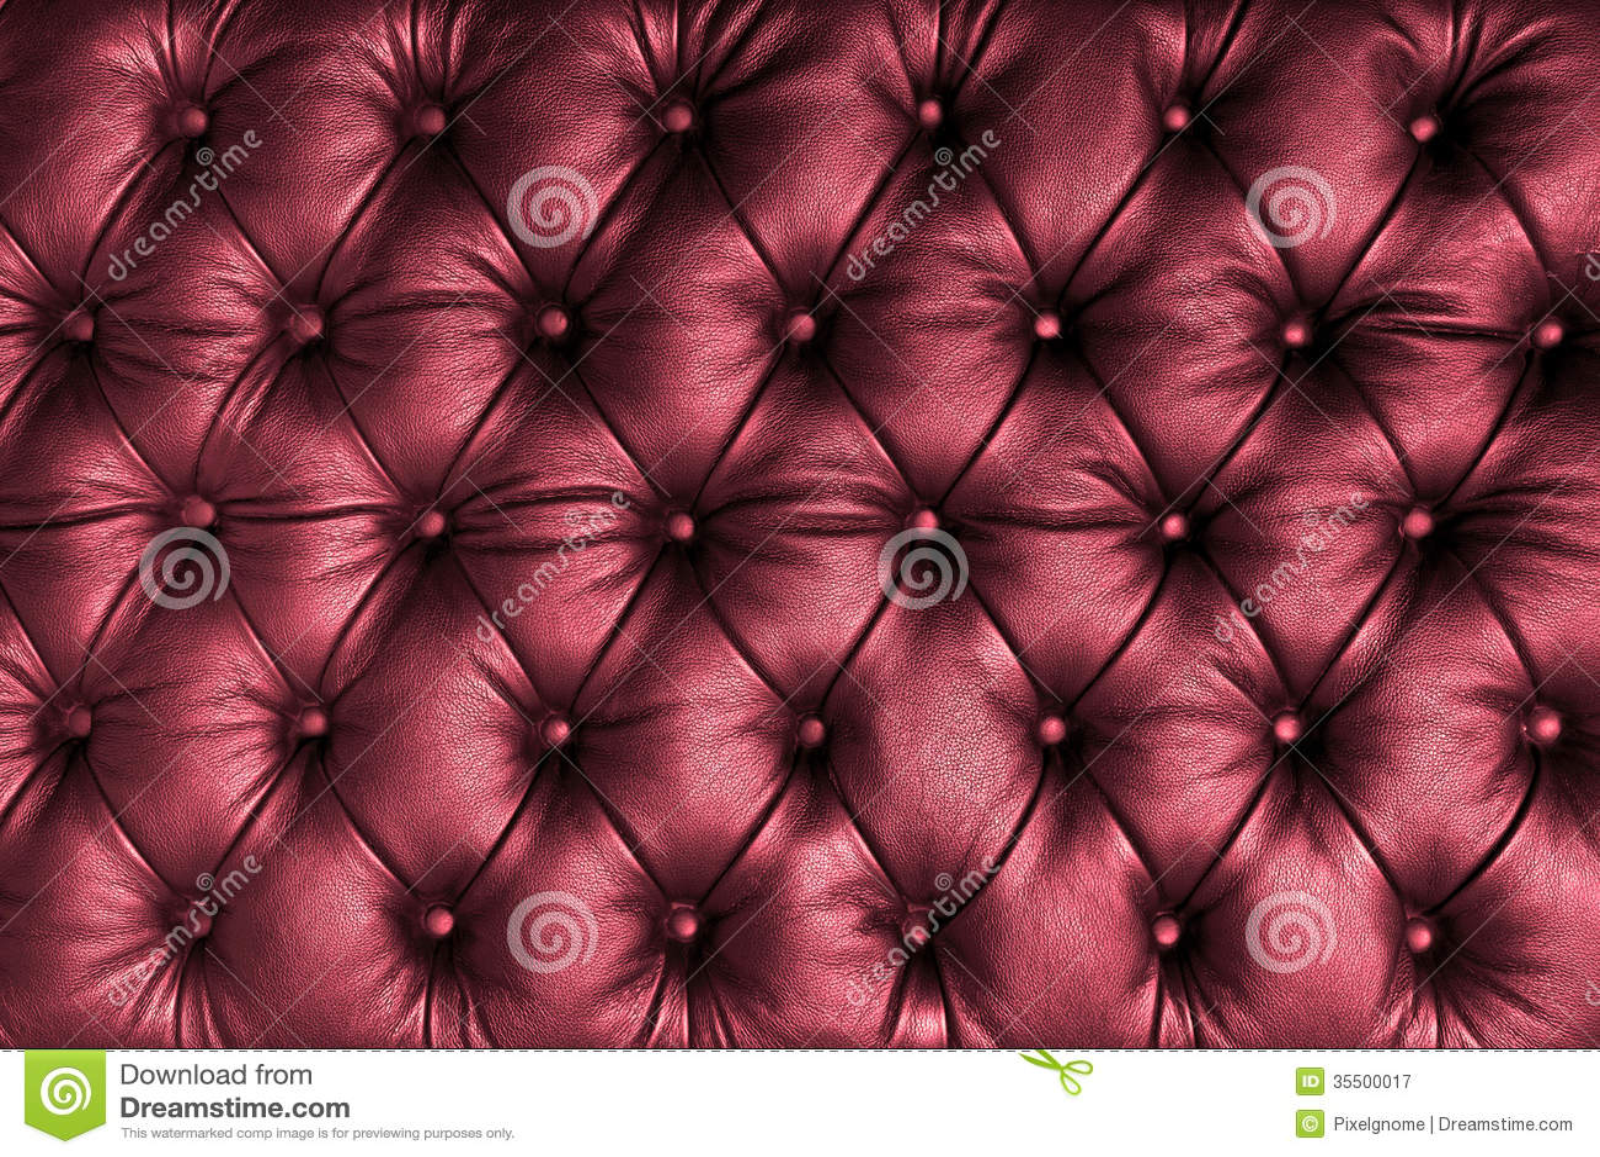 rot tuffted leder mit kn pfen lizenzfreie stockfotografie bild 35500017. Black Bedroom Furniture Sets. Home Design Ideas